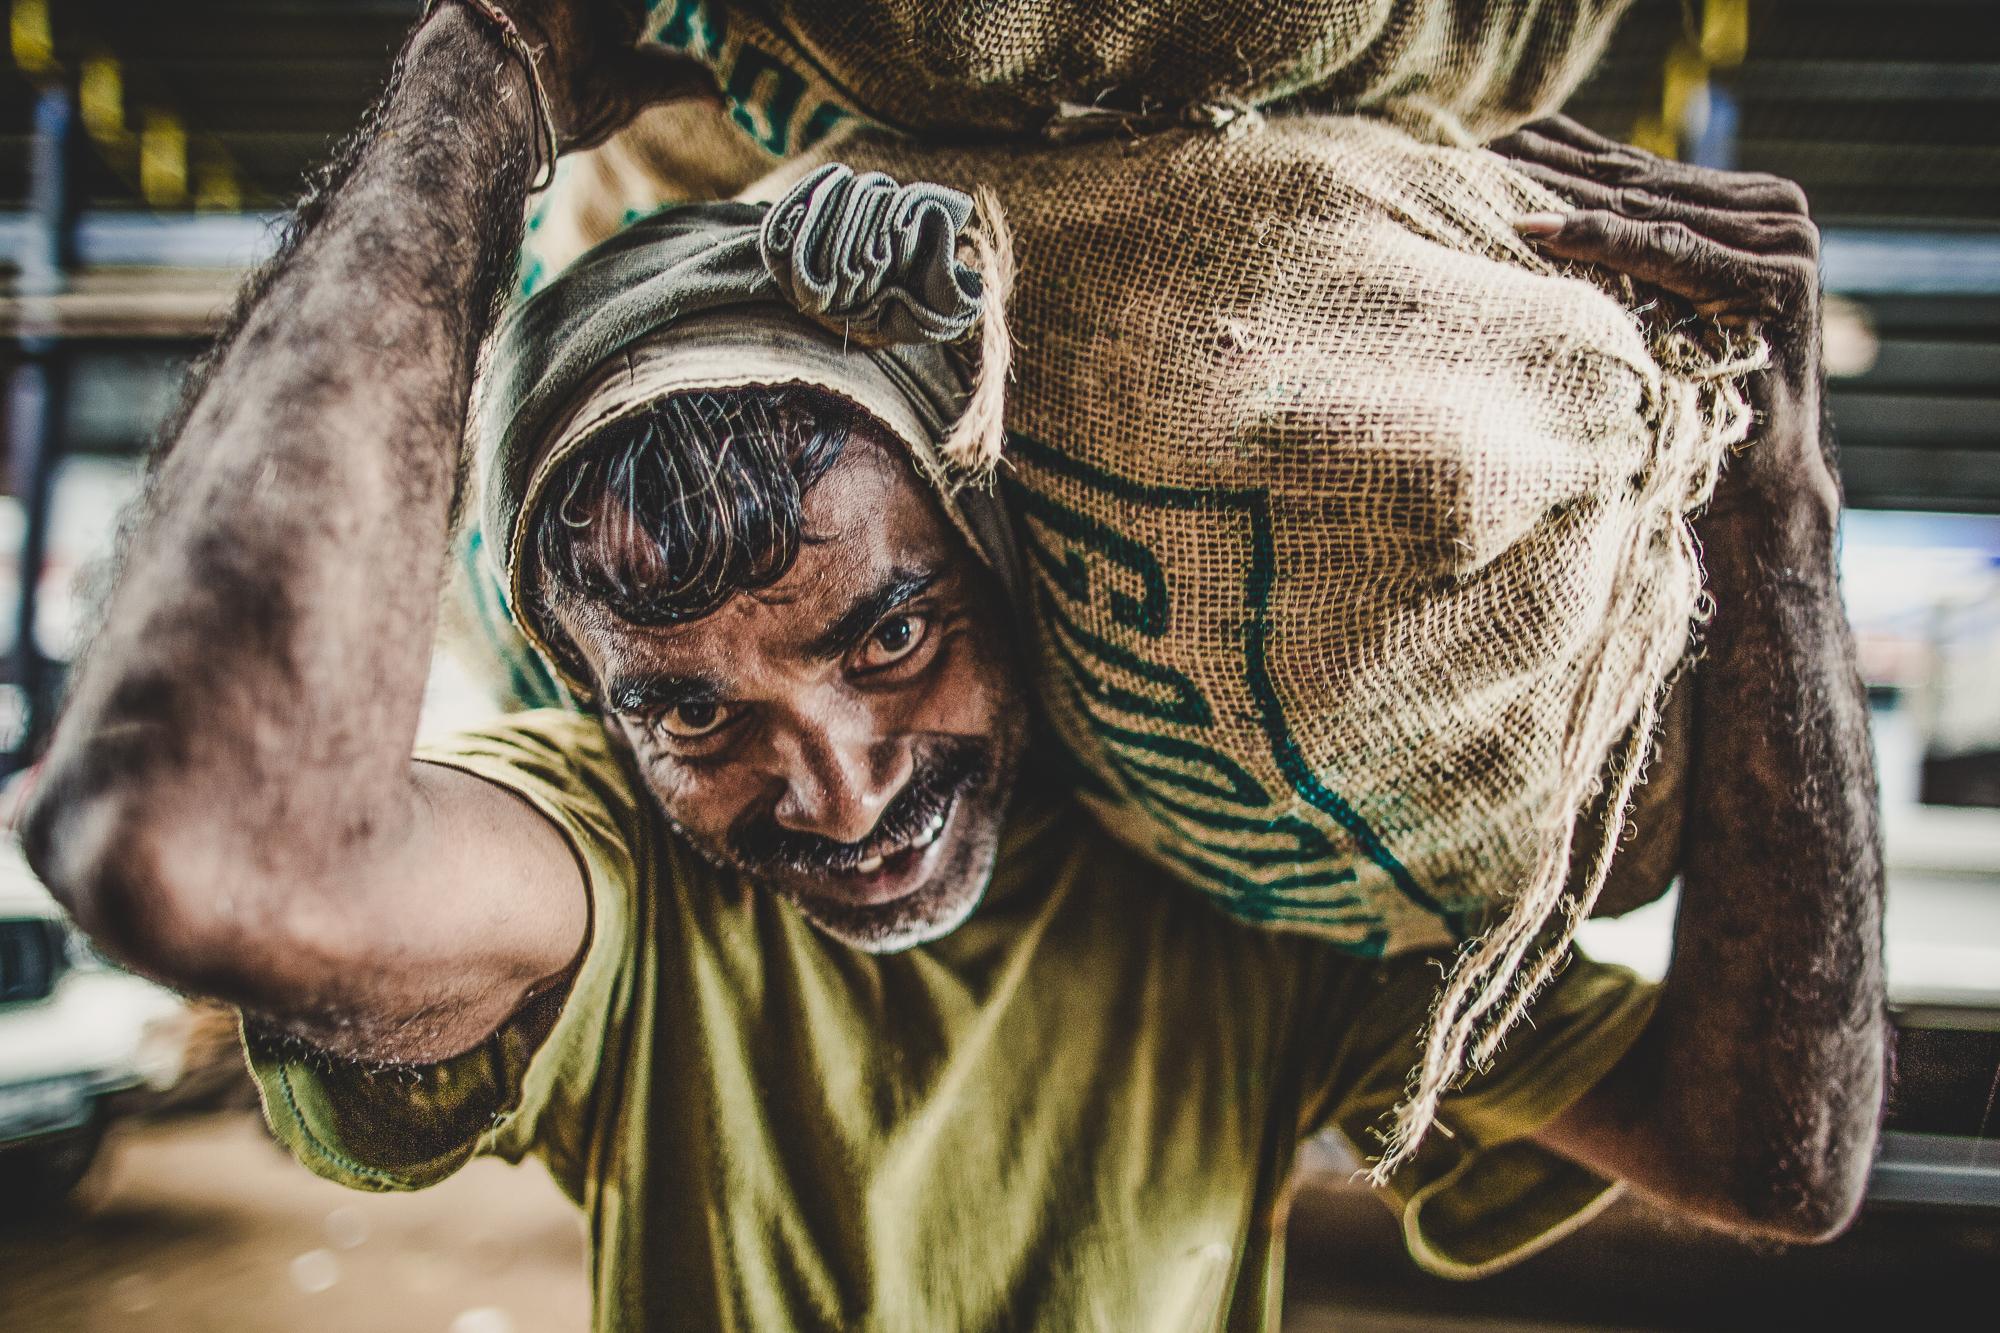 Man carrying sacks